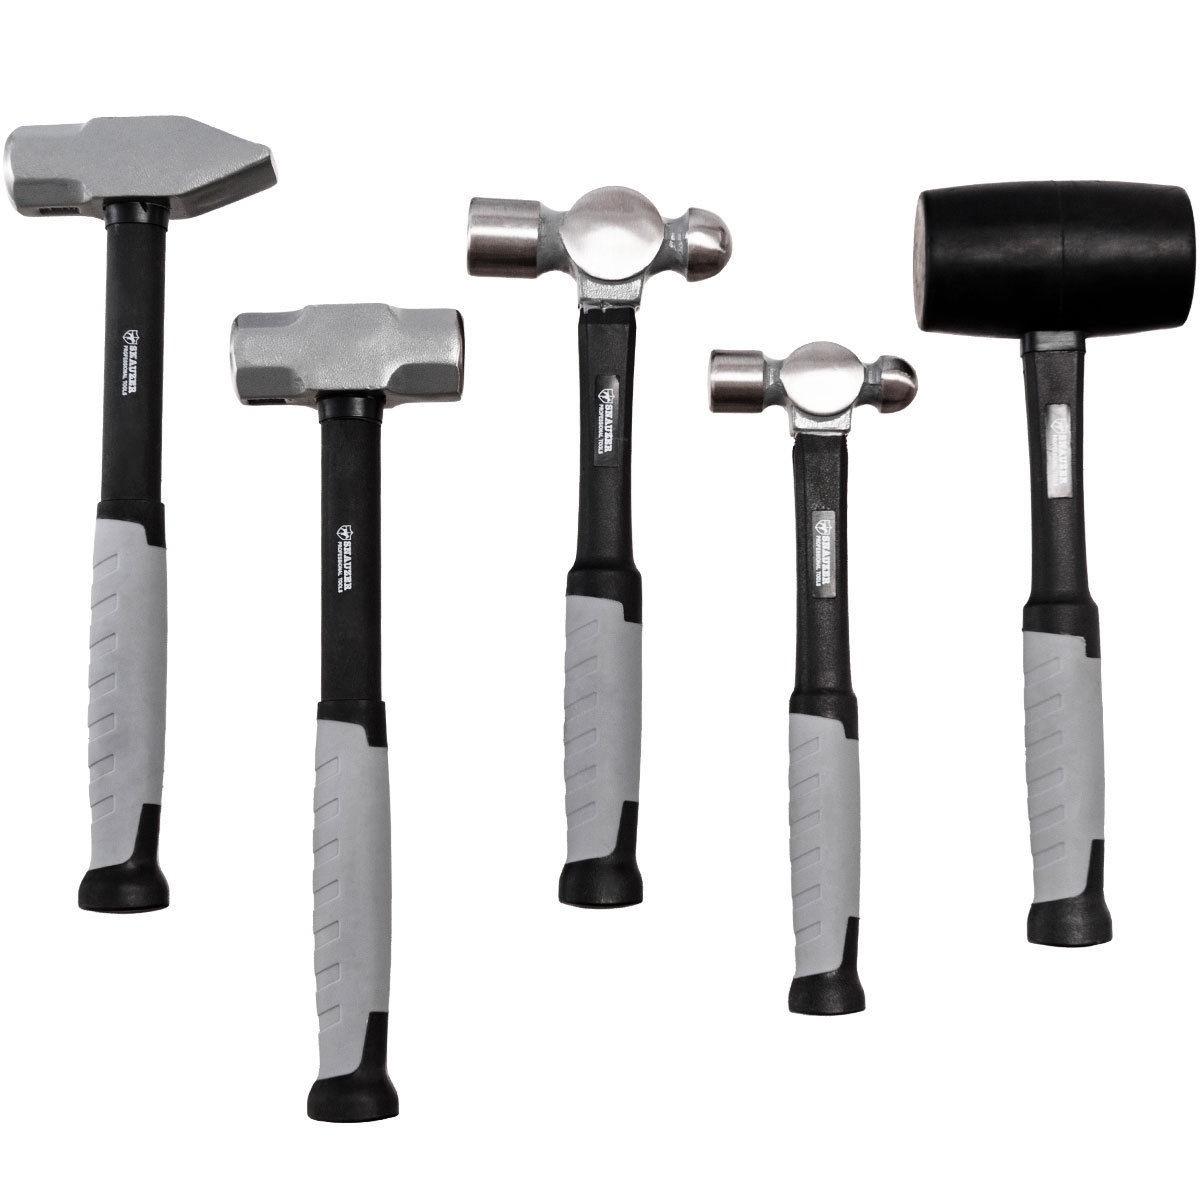 Costway 5 Piece Professional Blacksmith Propane Forge Hammer Set - $39.95 + Free Shipping